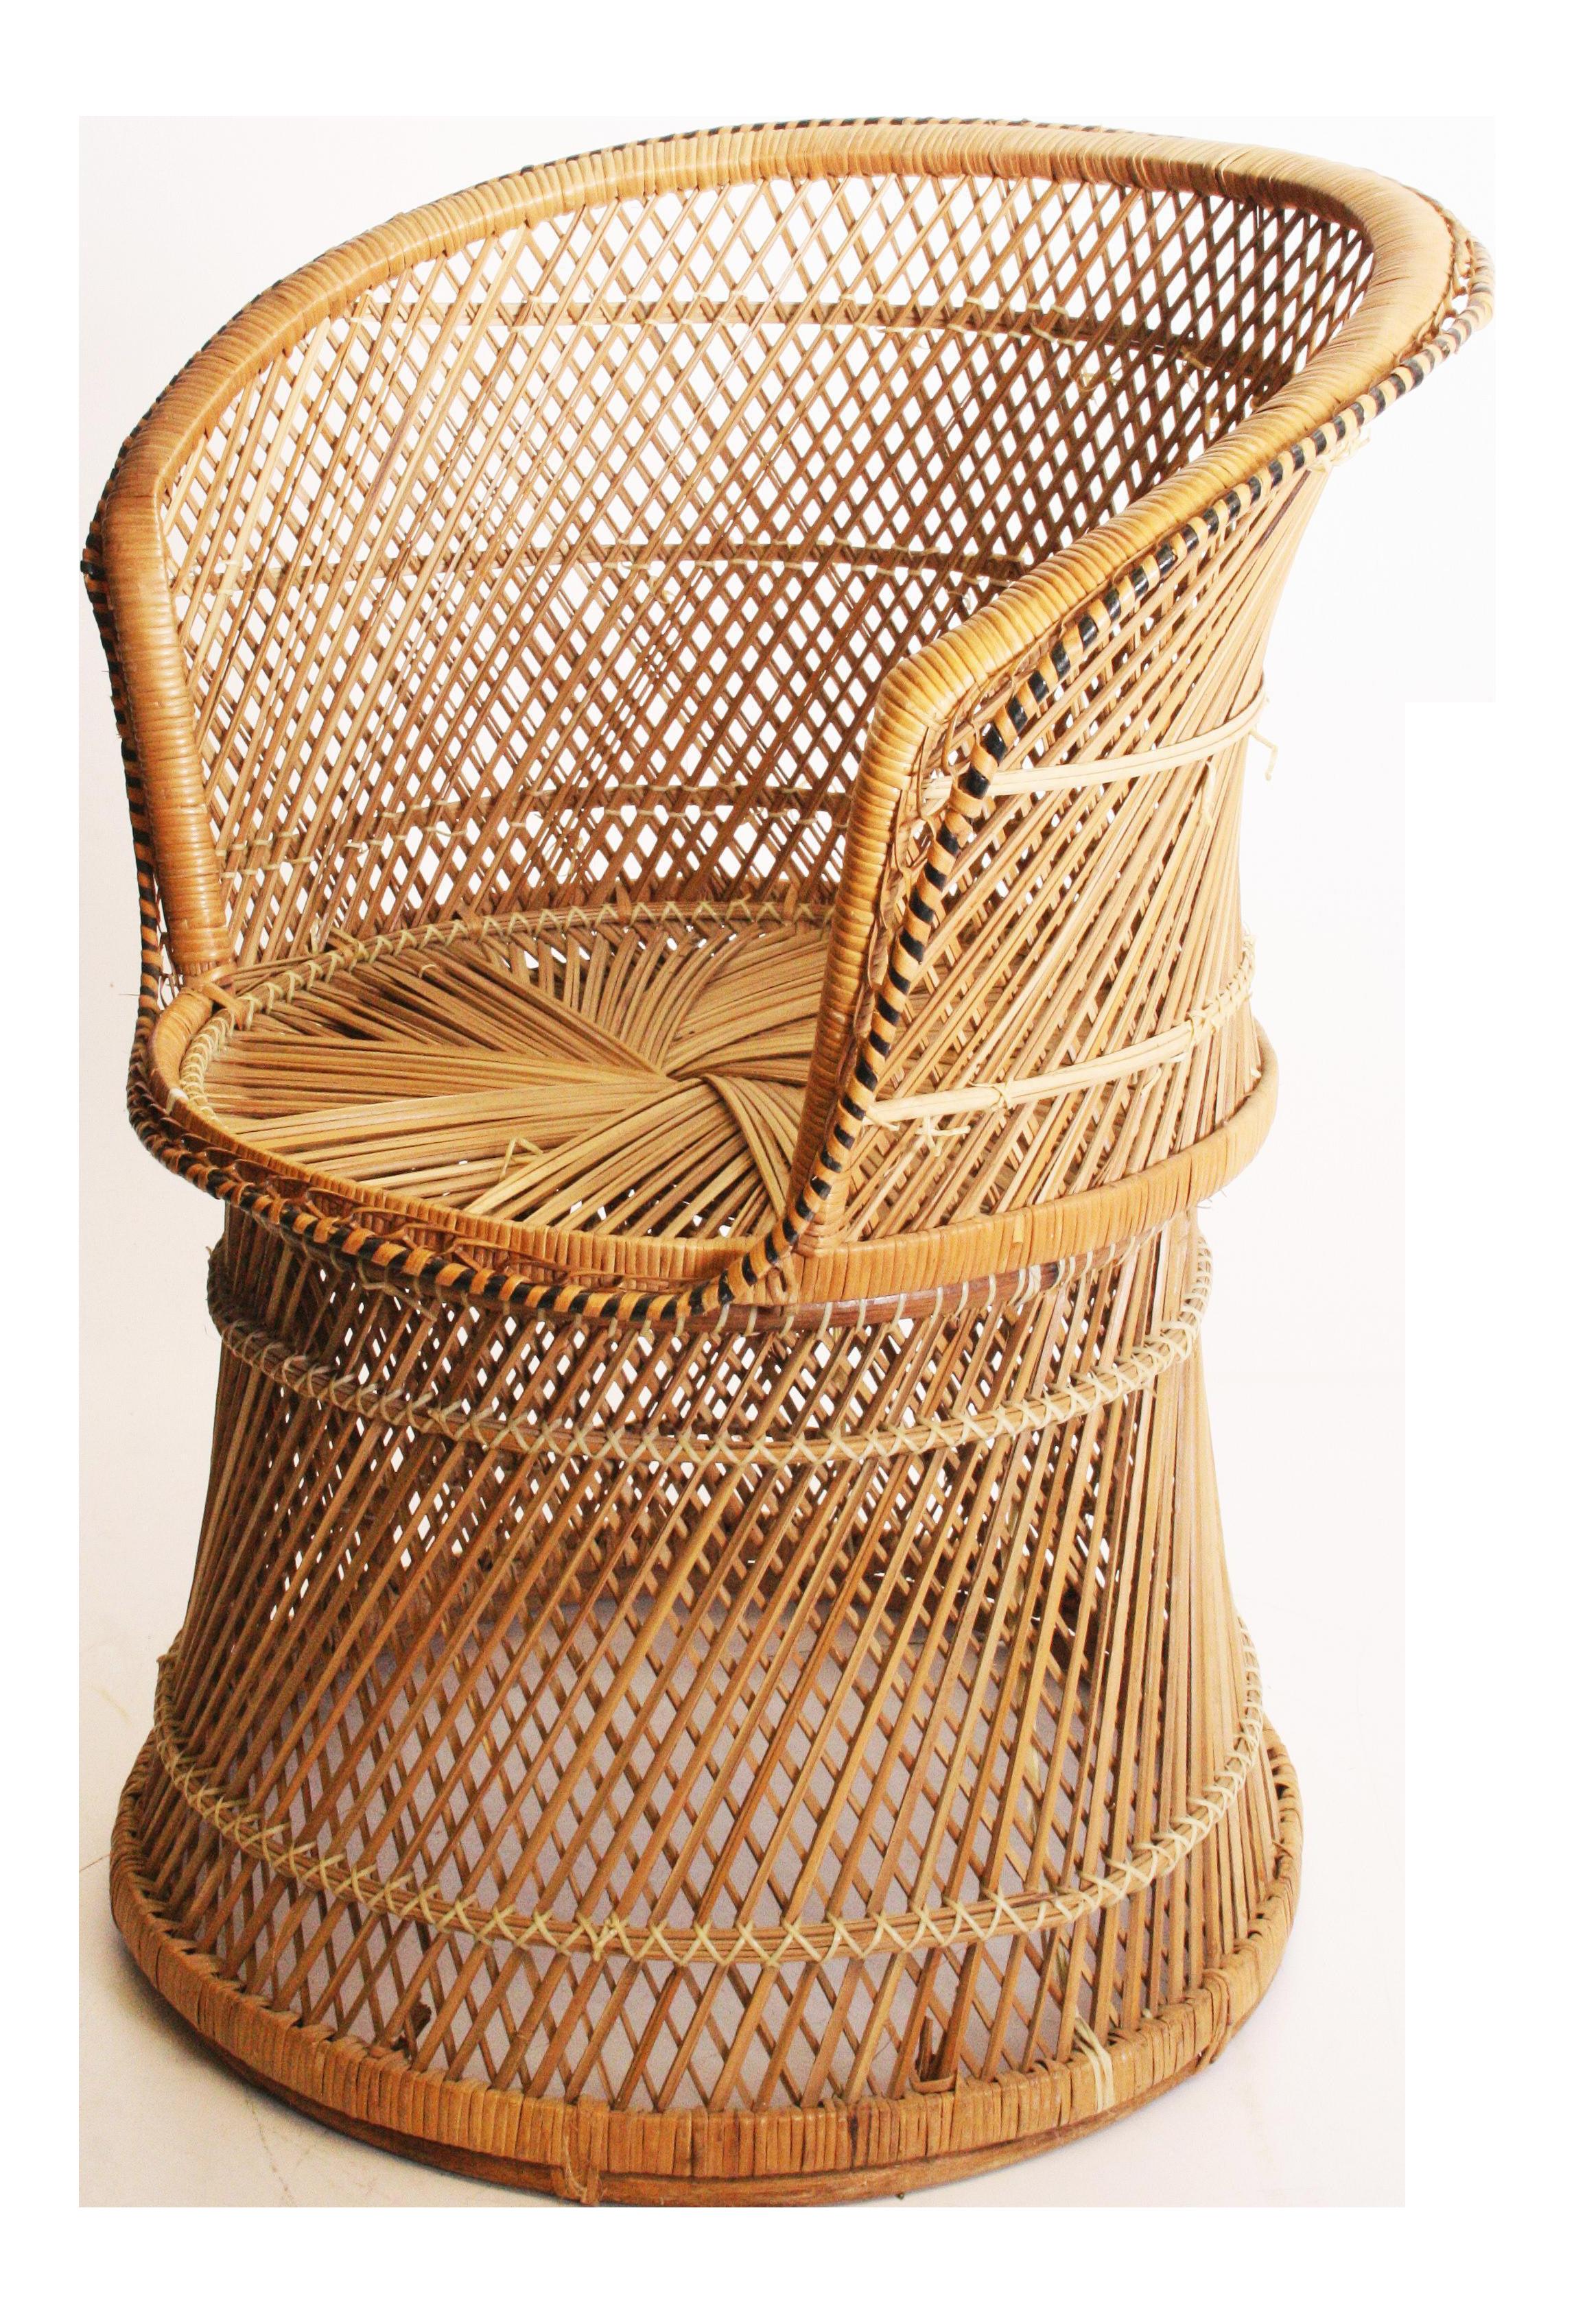 Vintage Boho Chic Wicker Barrel Chair